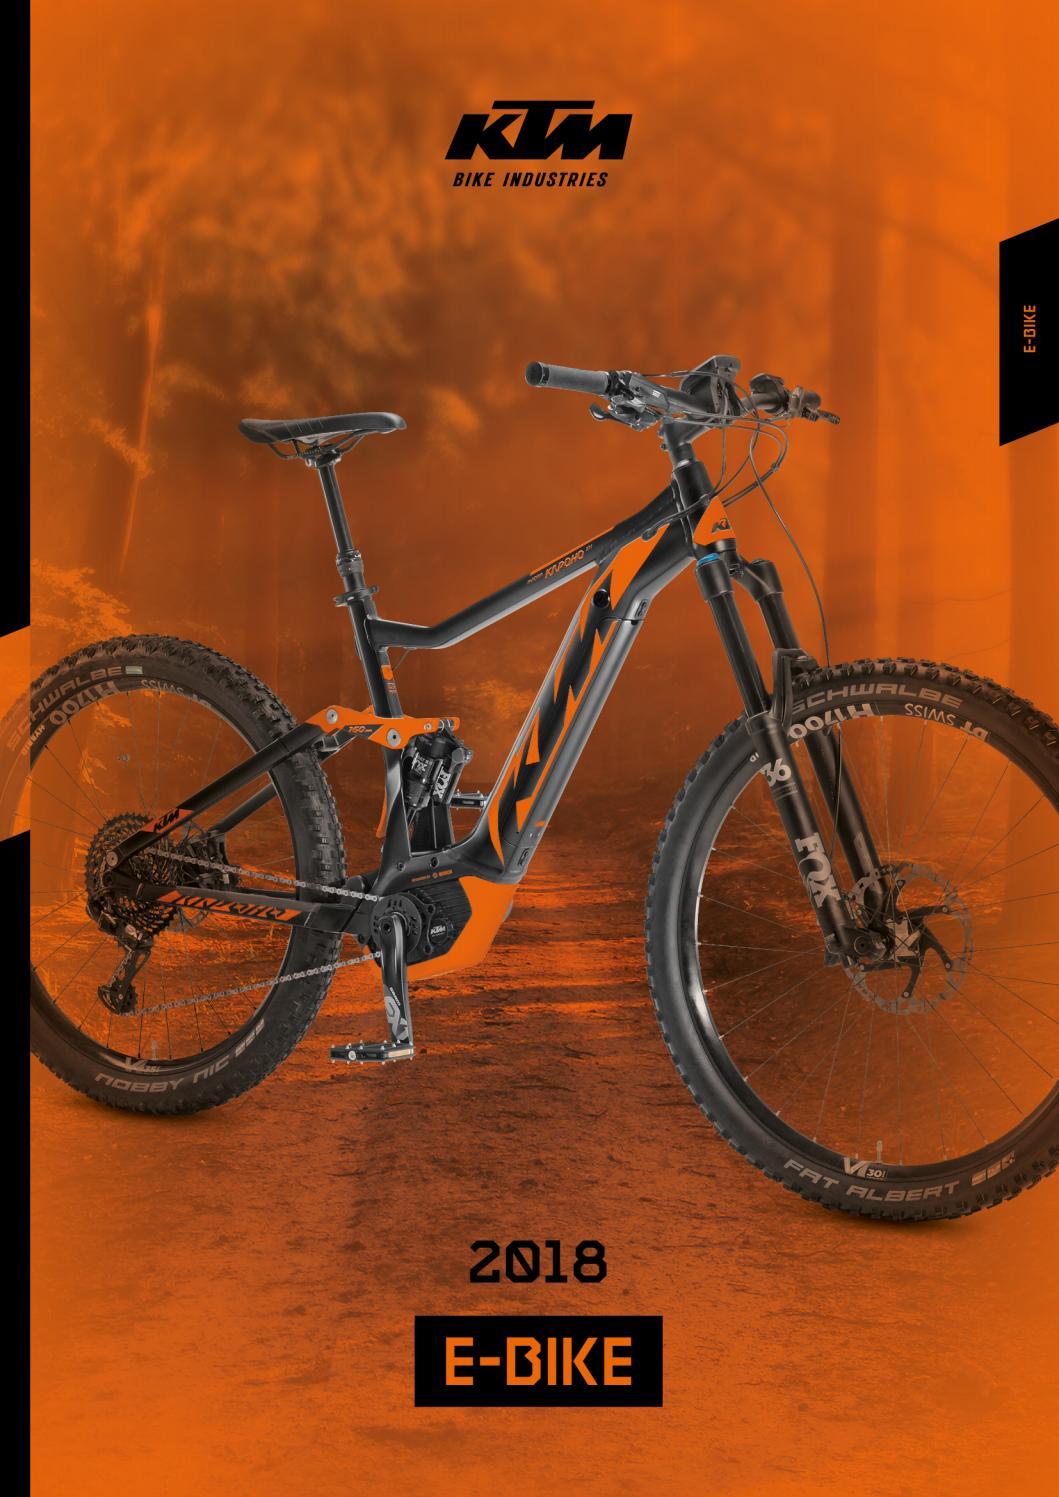 ktm e bike catalogue 2018 by ktm bike industries issuu. Black Bedroom Furniture Sets. Home Design Ideas